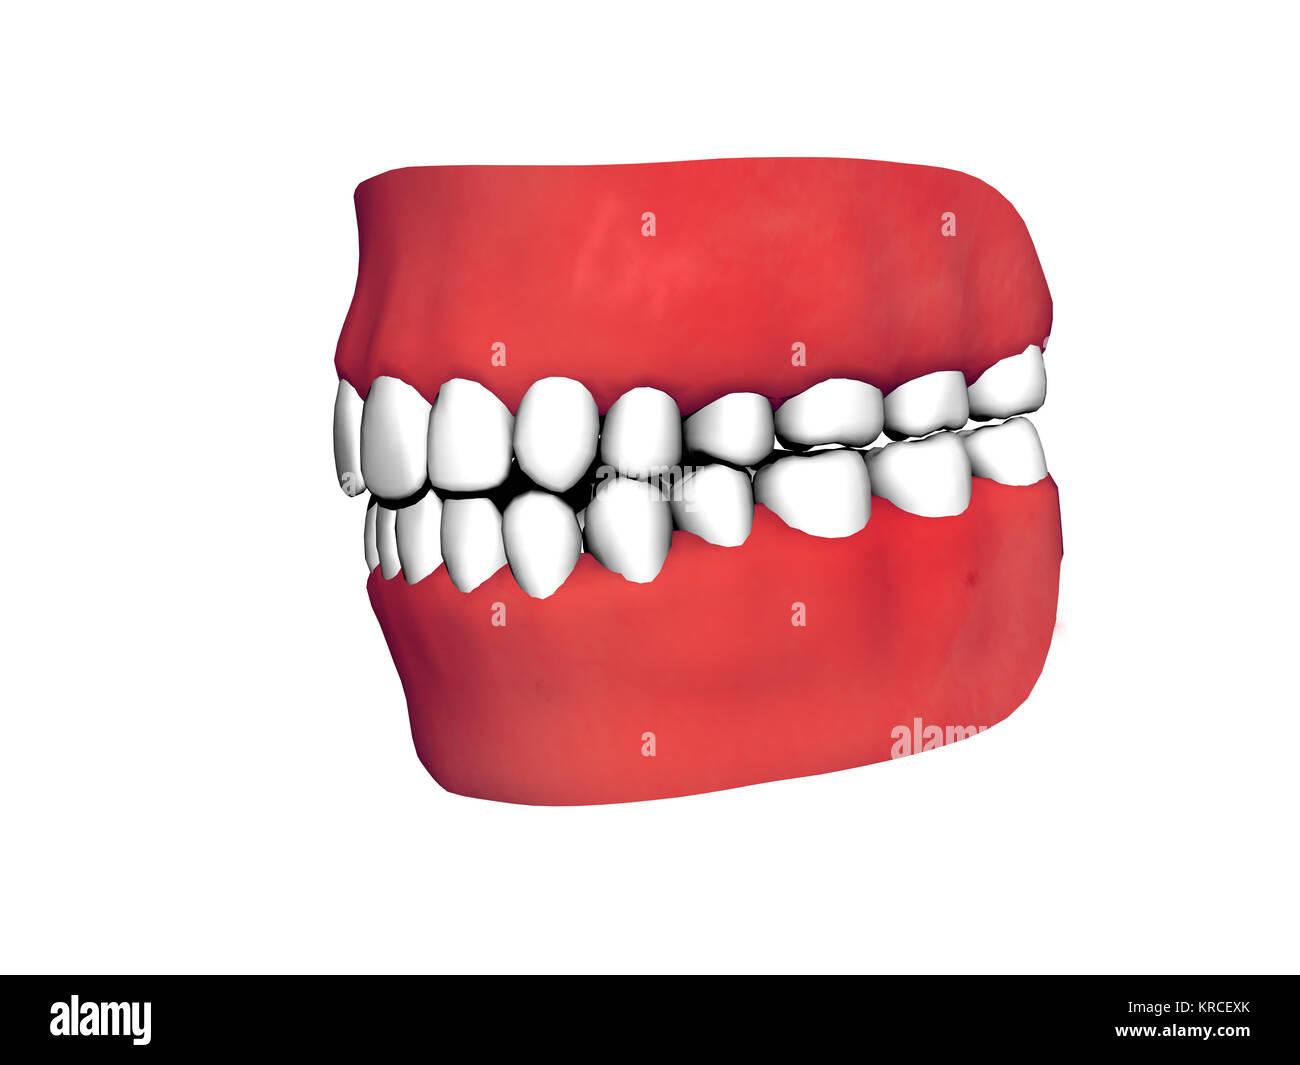 dentition free - Stock Image